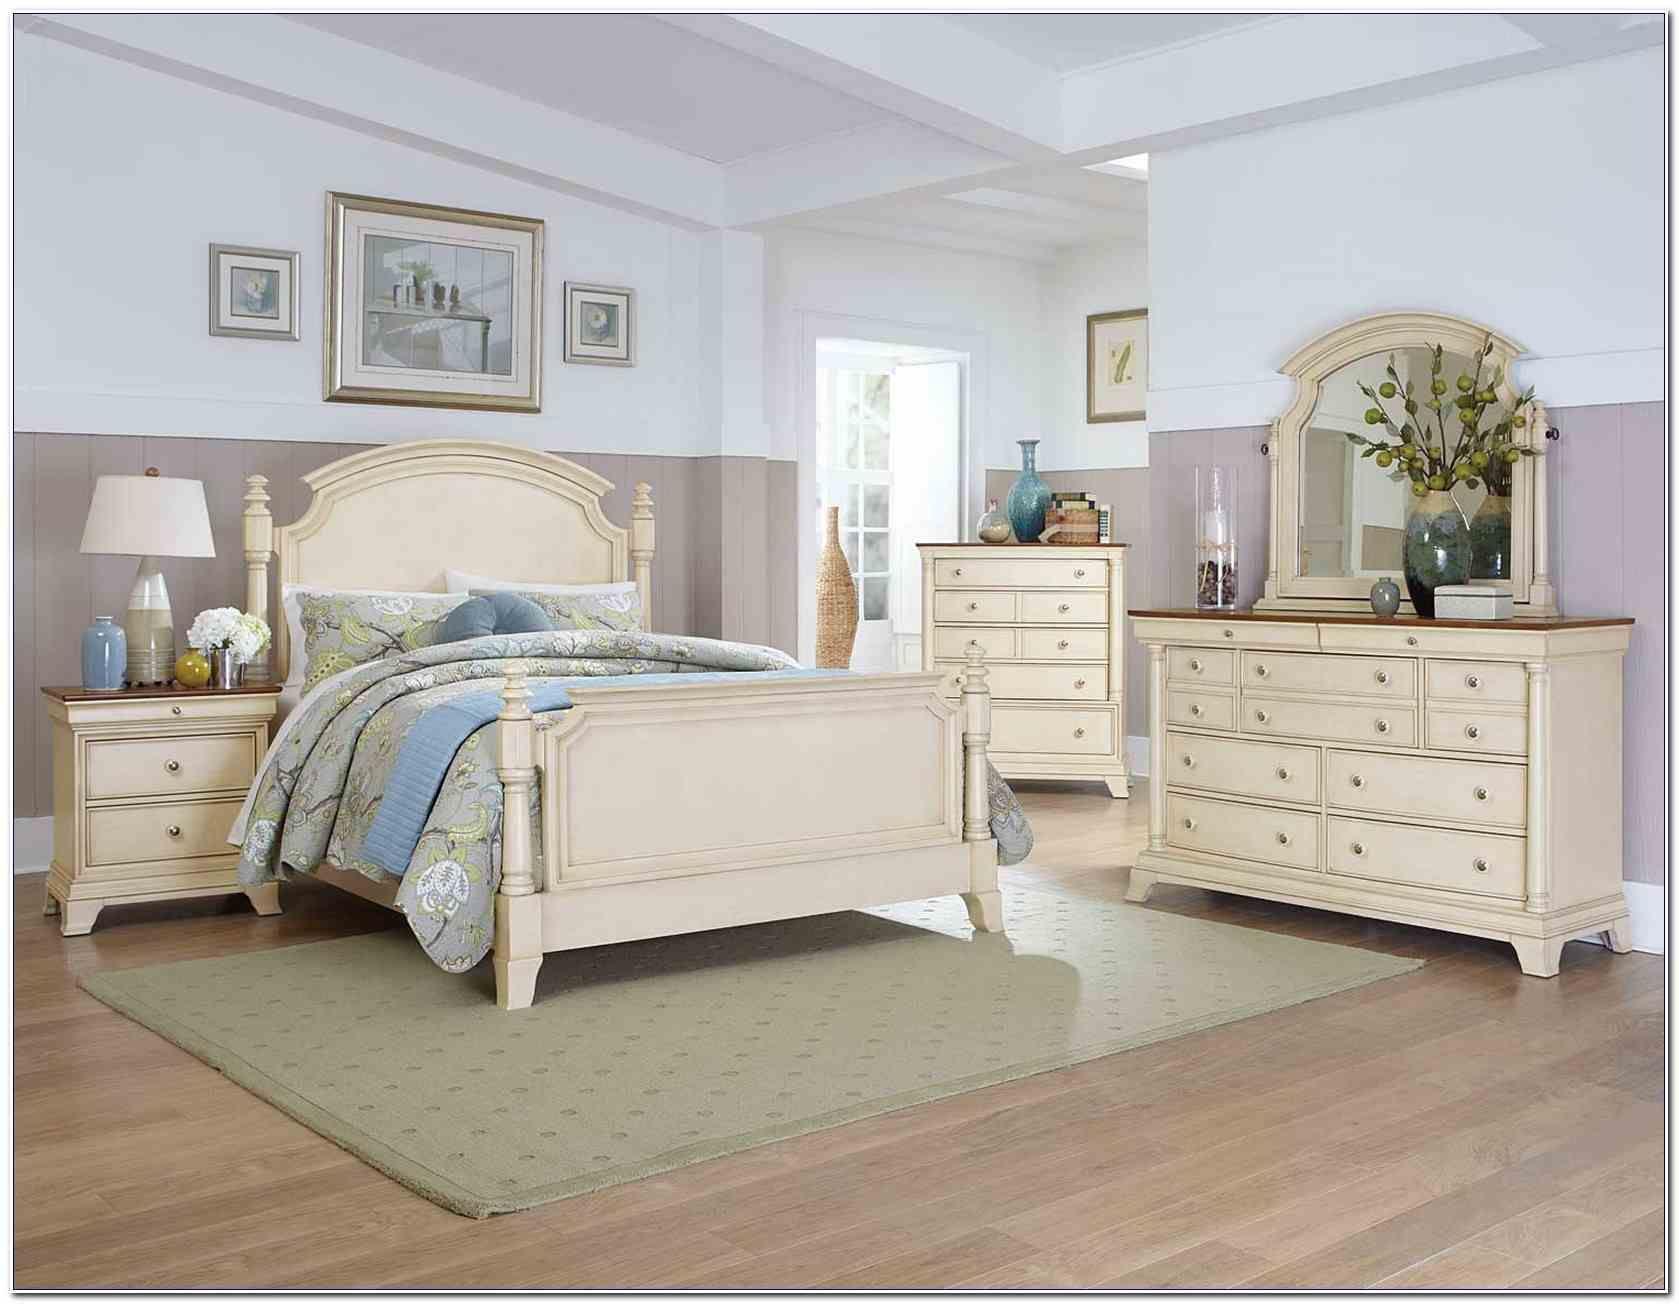 Cream Colored Bedroom Furniture Sets